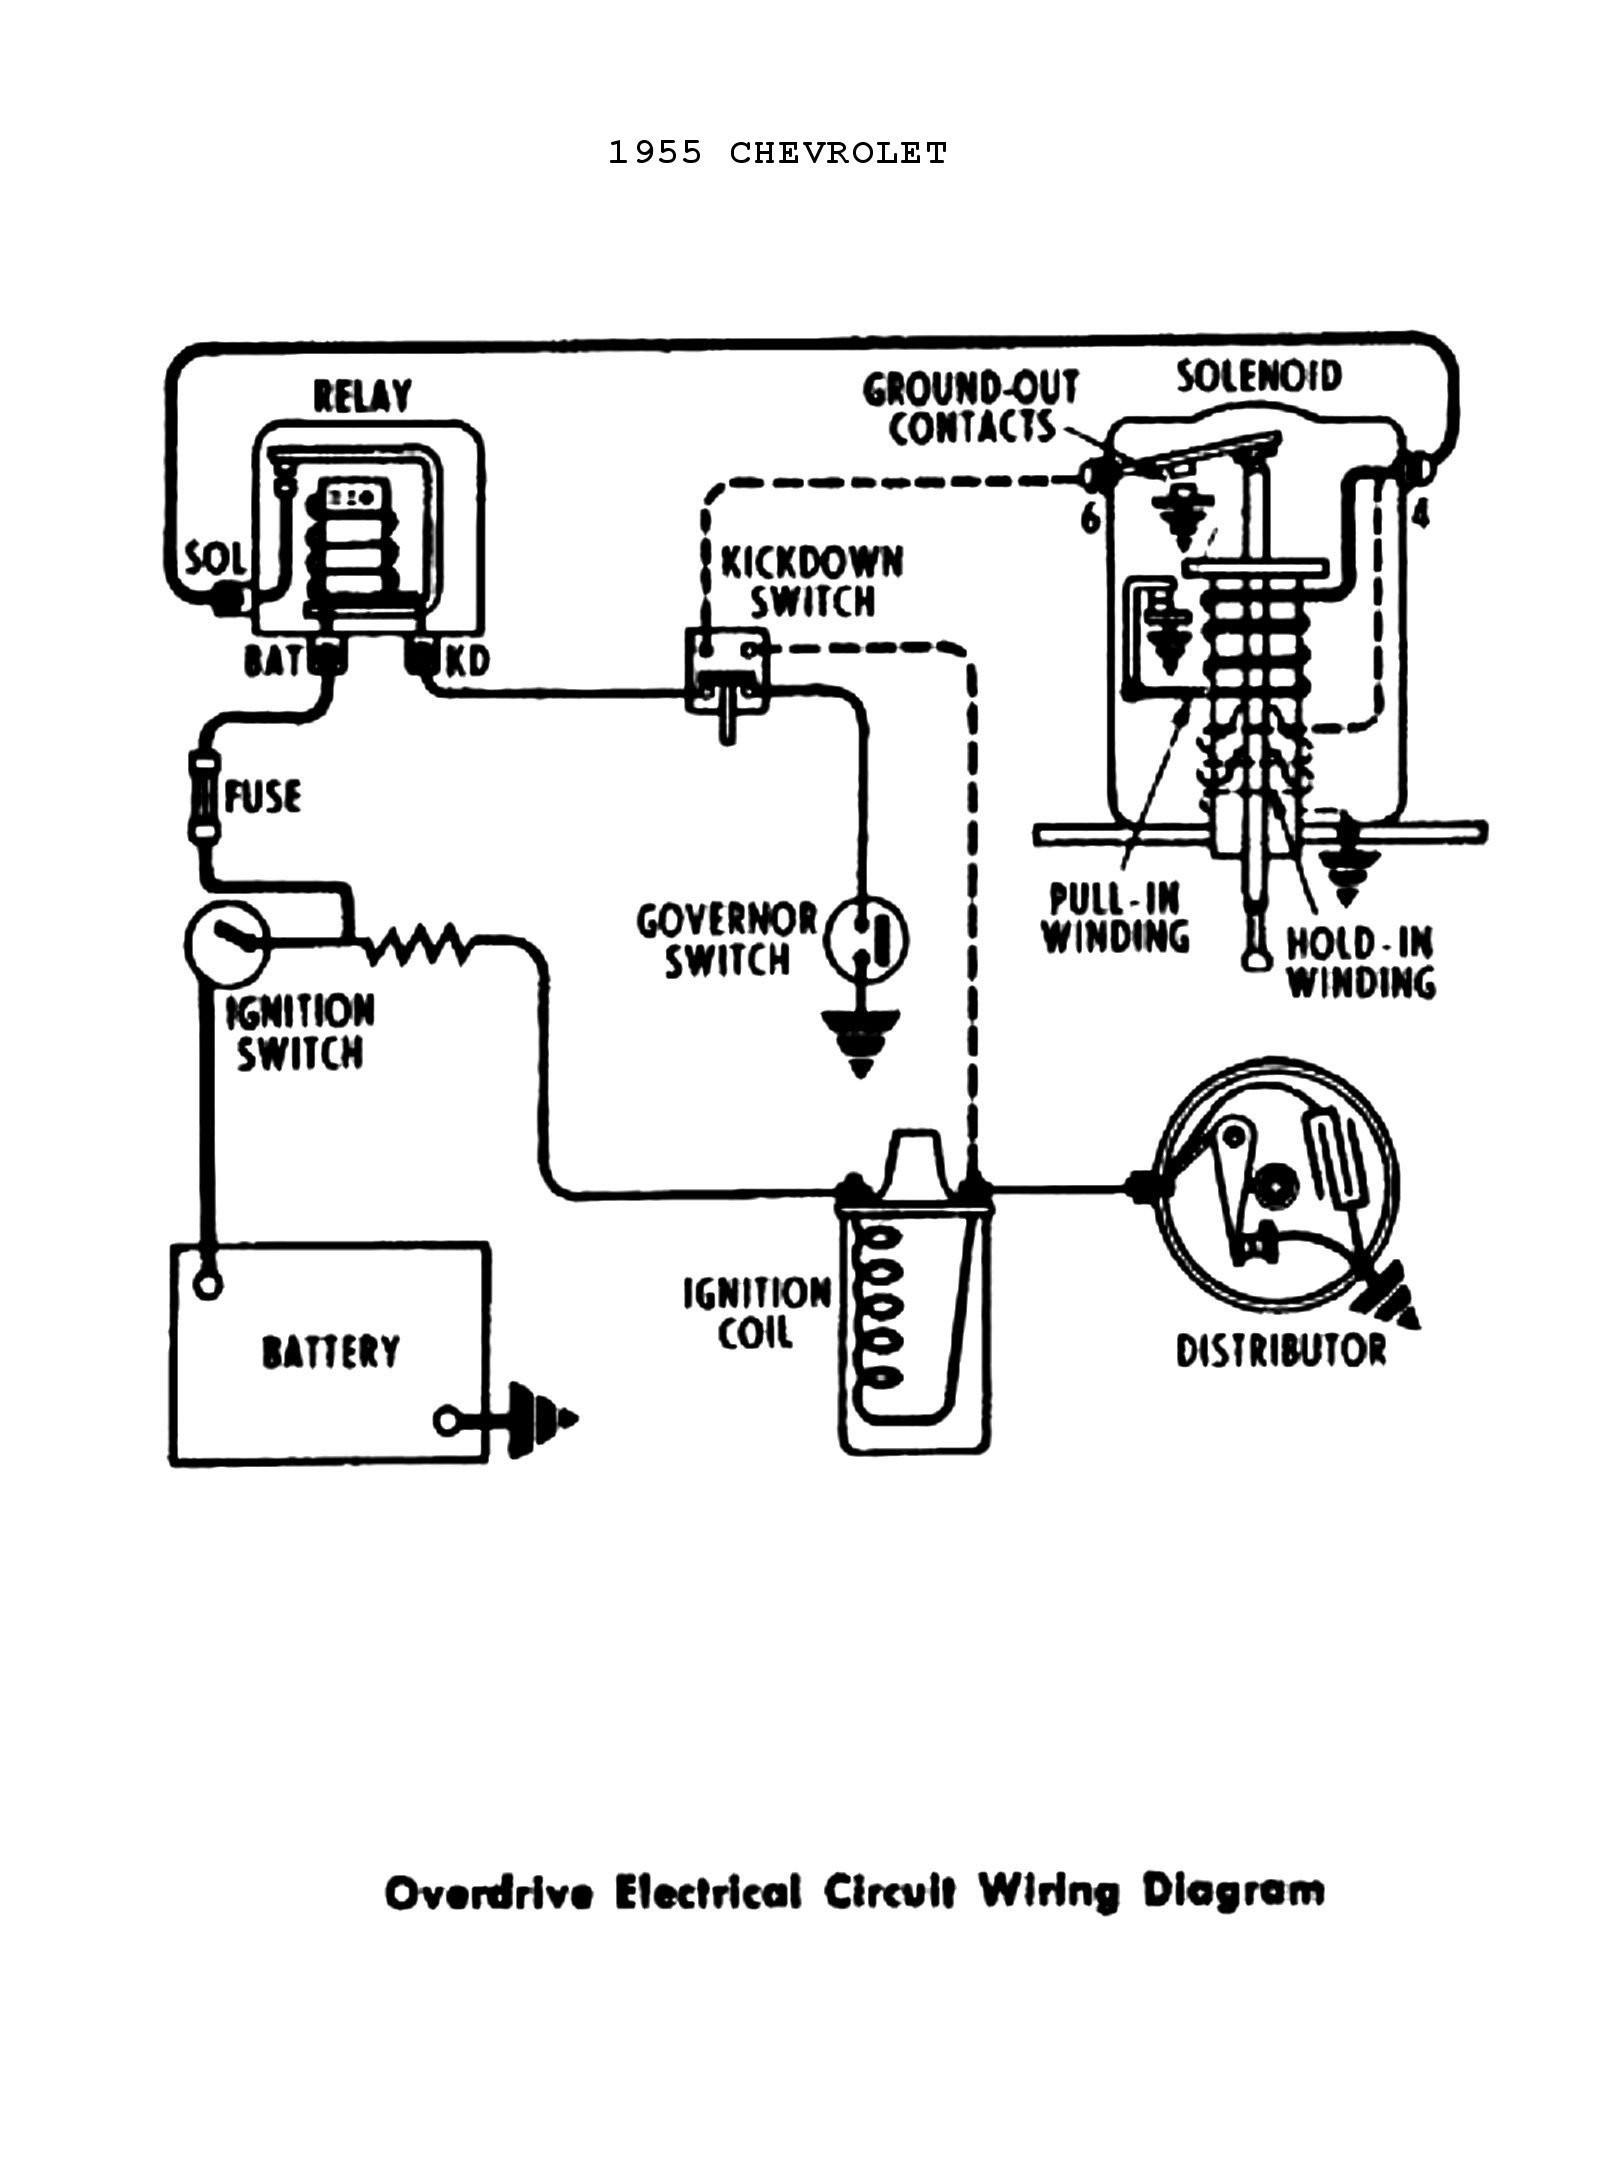 Diagram Dodge Points Distributor Wiring Diagram Full Version Hd Quality Wiring Diagram Diagramjacoby Ca Couture Lyon Et Region Fr